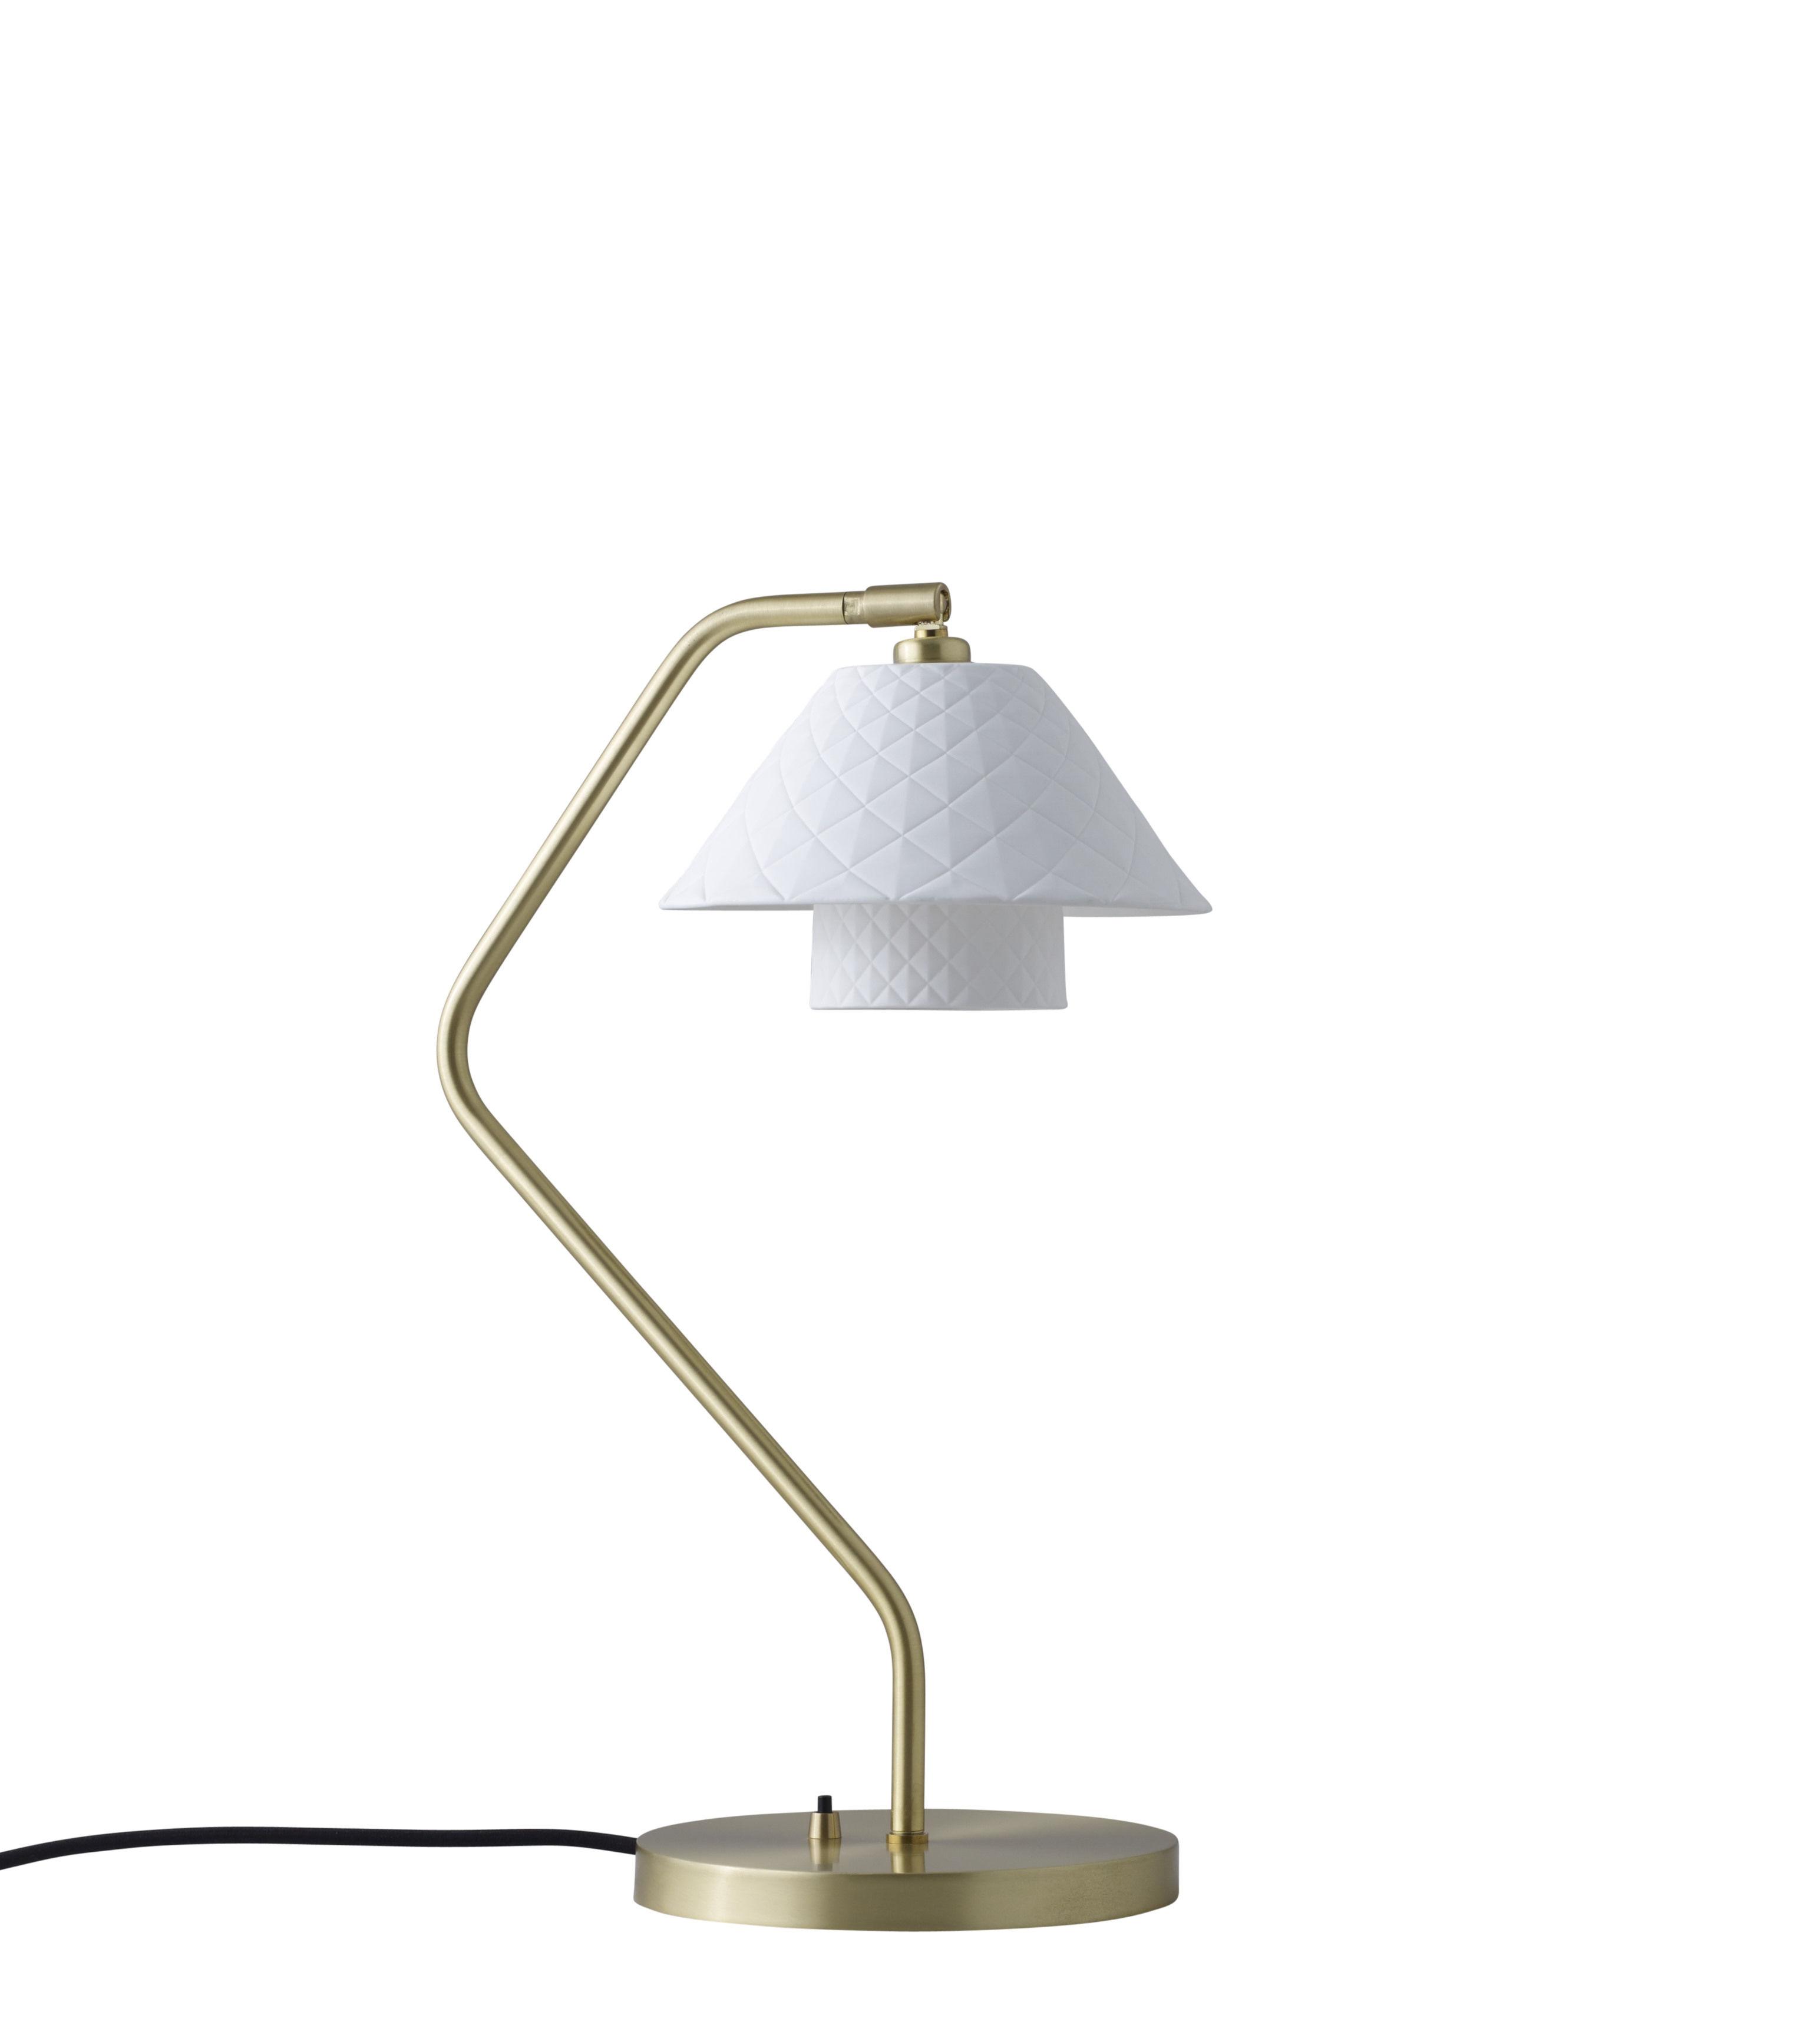 Lighting - Desk Lamps - Oxford Double Desk lamp - / Polished brass & porcelain by Original BTC - Matt white / Polished brass - Brass, China